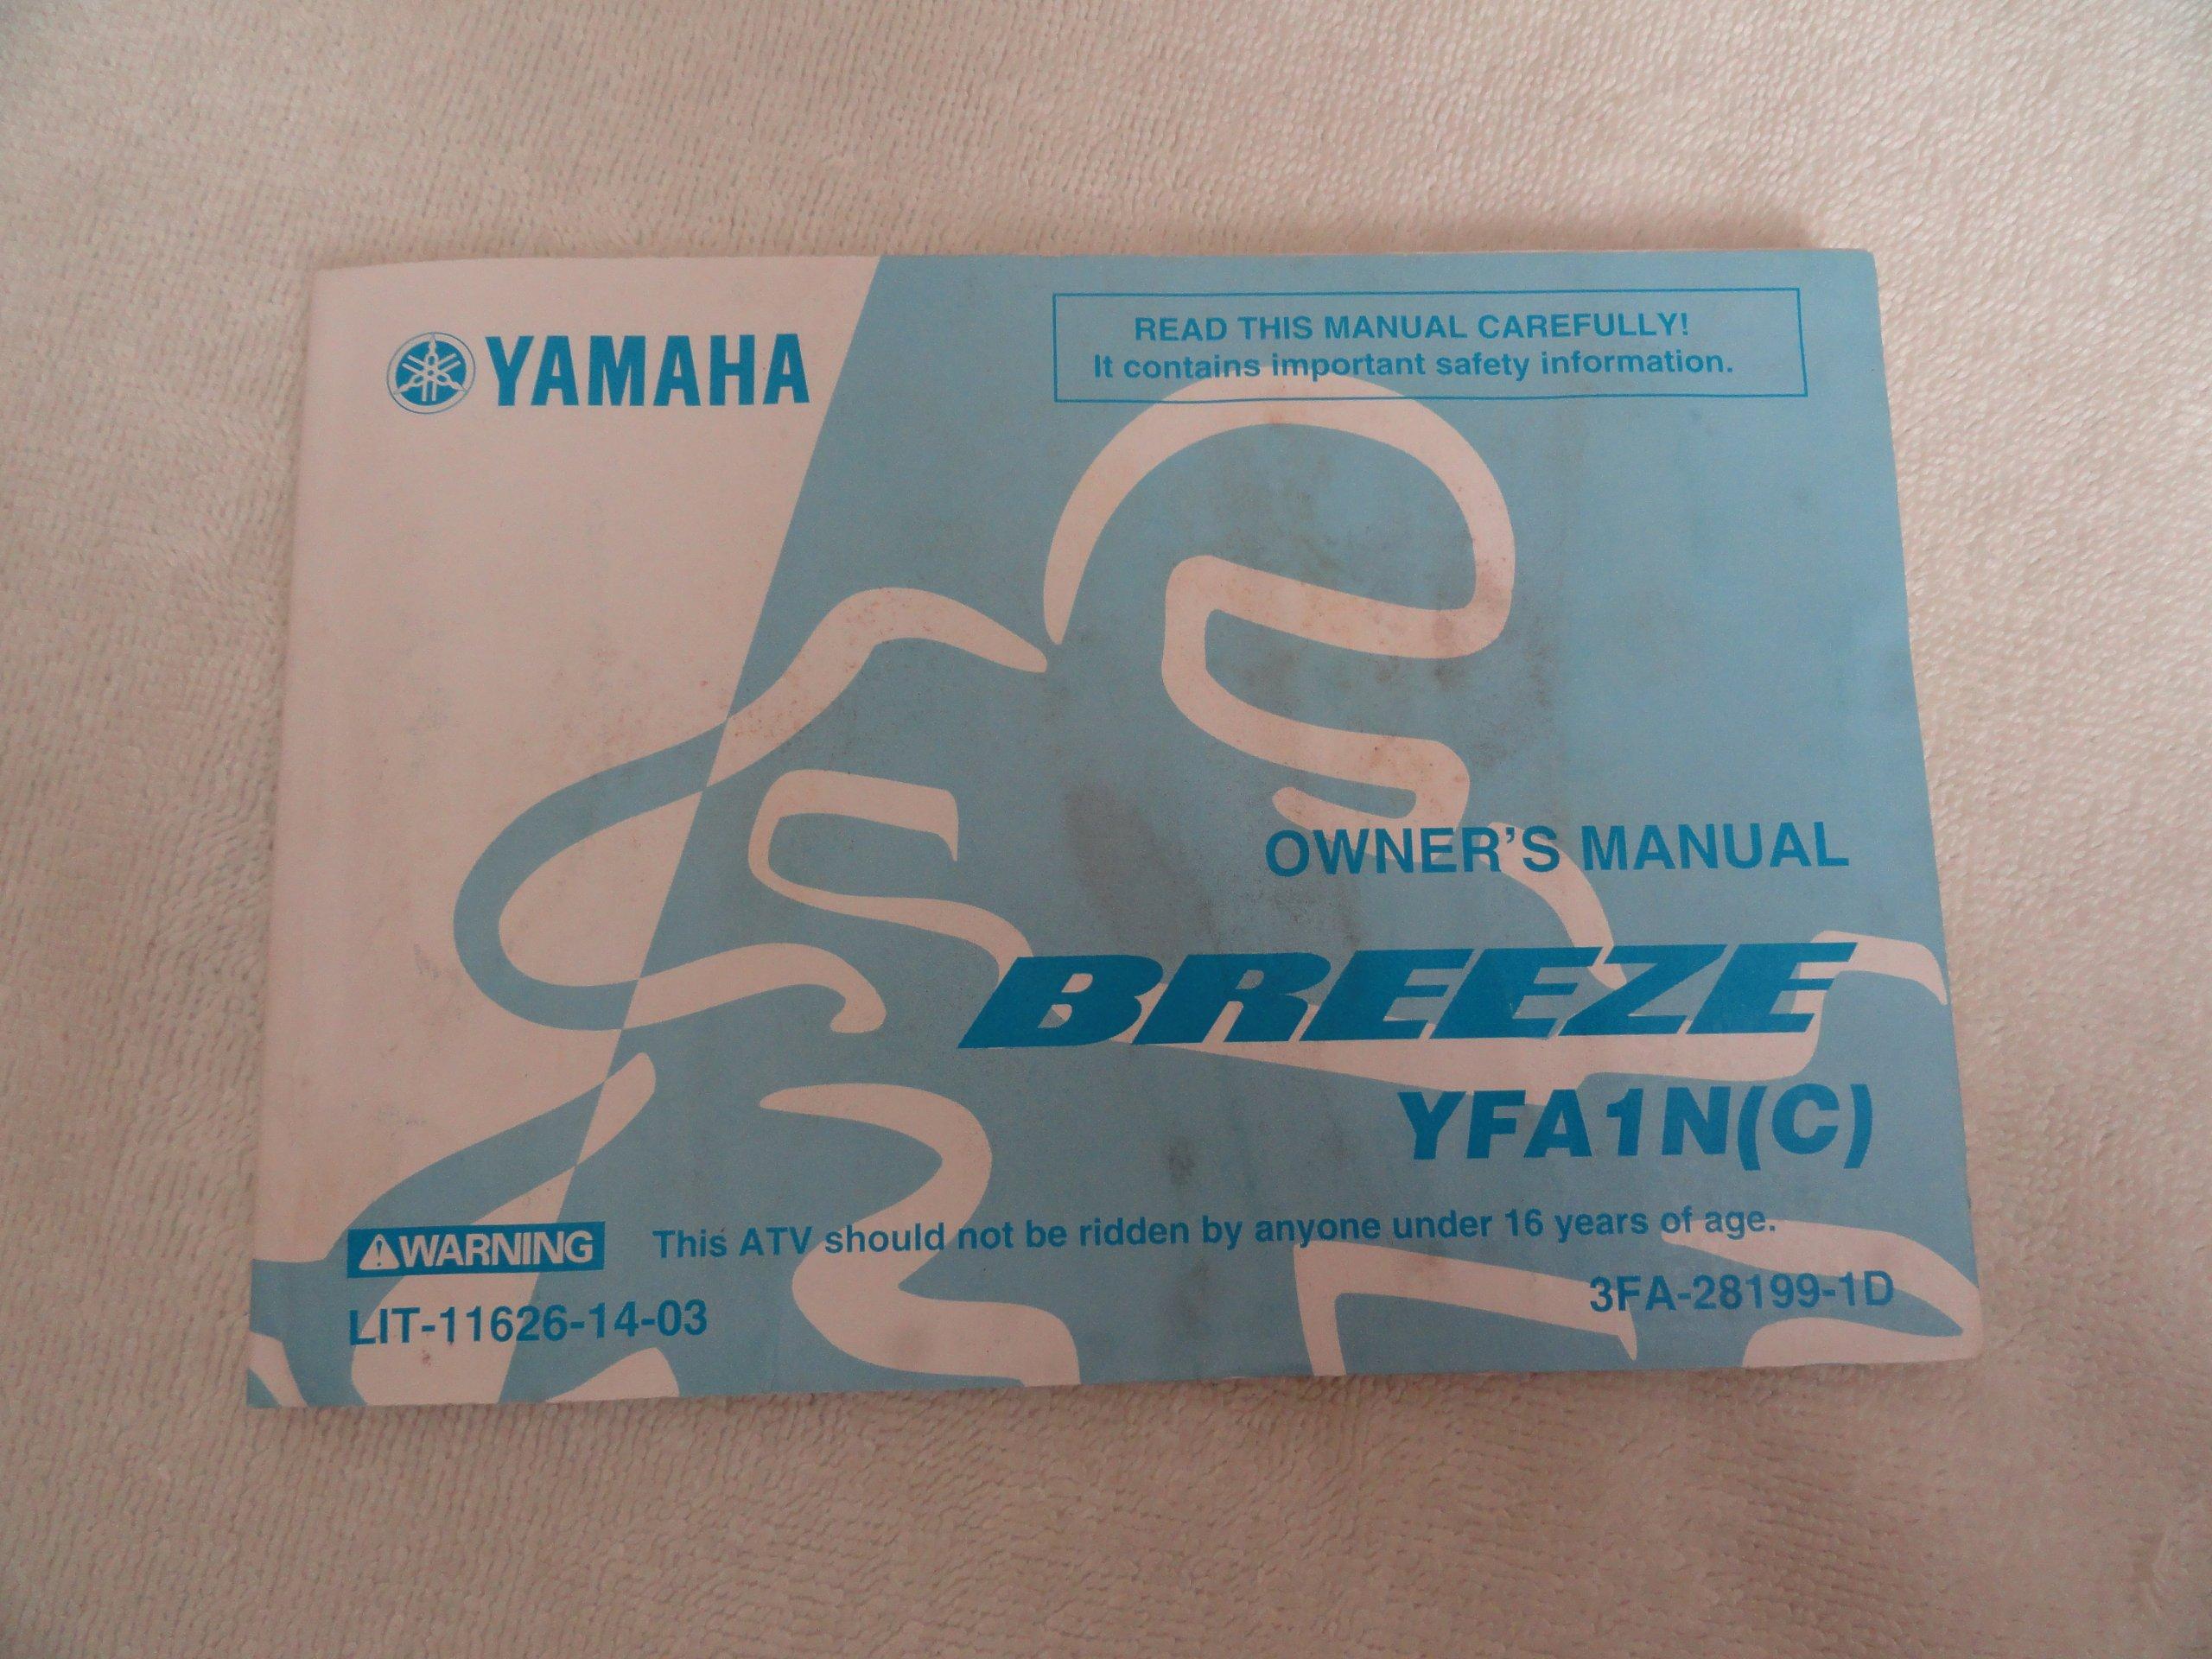 2000 2001 yamaha breeze owners manual yfa1n c yamaha amazon com rh amazon com Yamaha 701 Remote Control Manual Yamaha Stereo Manuals